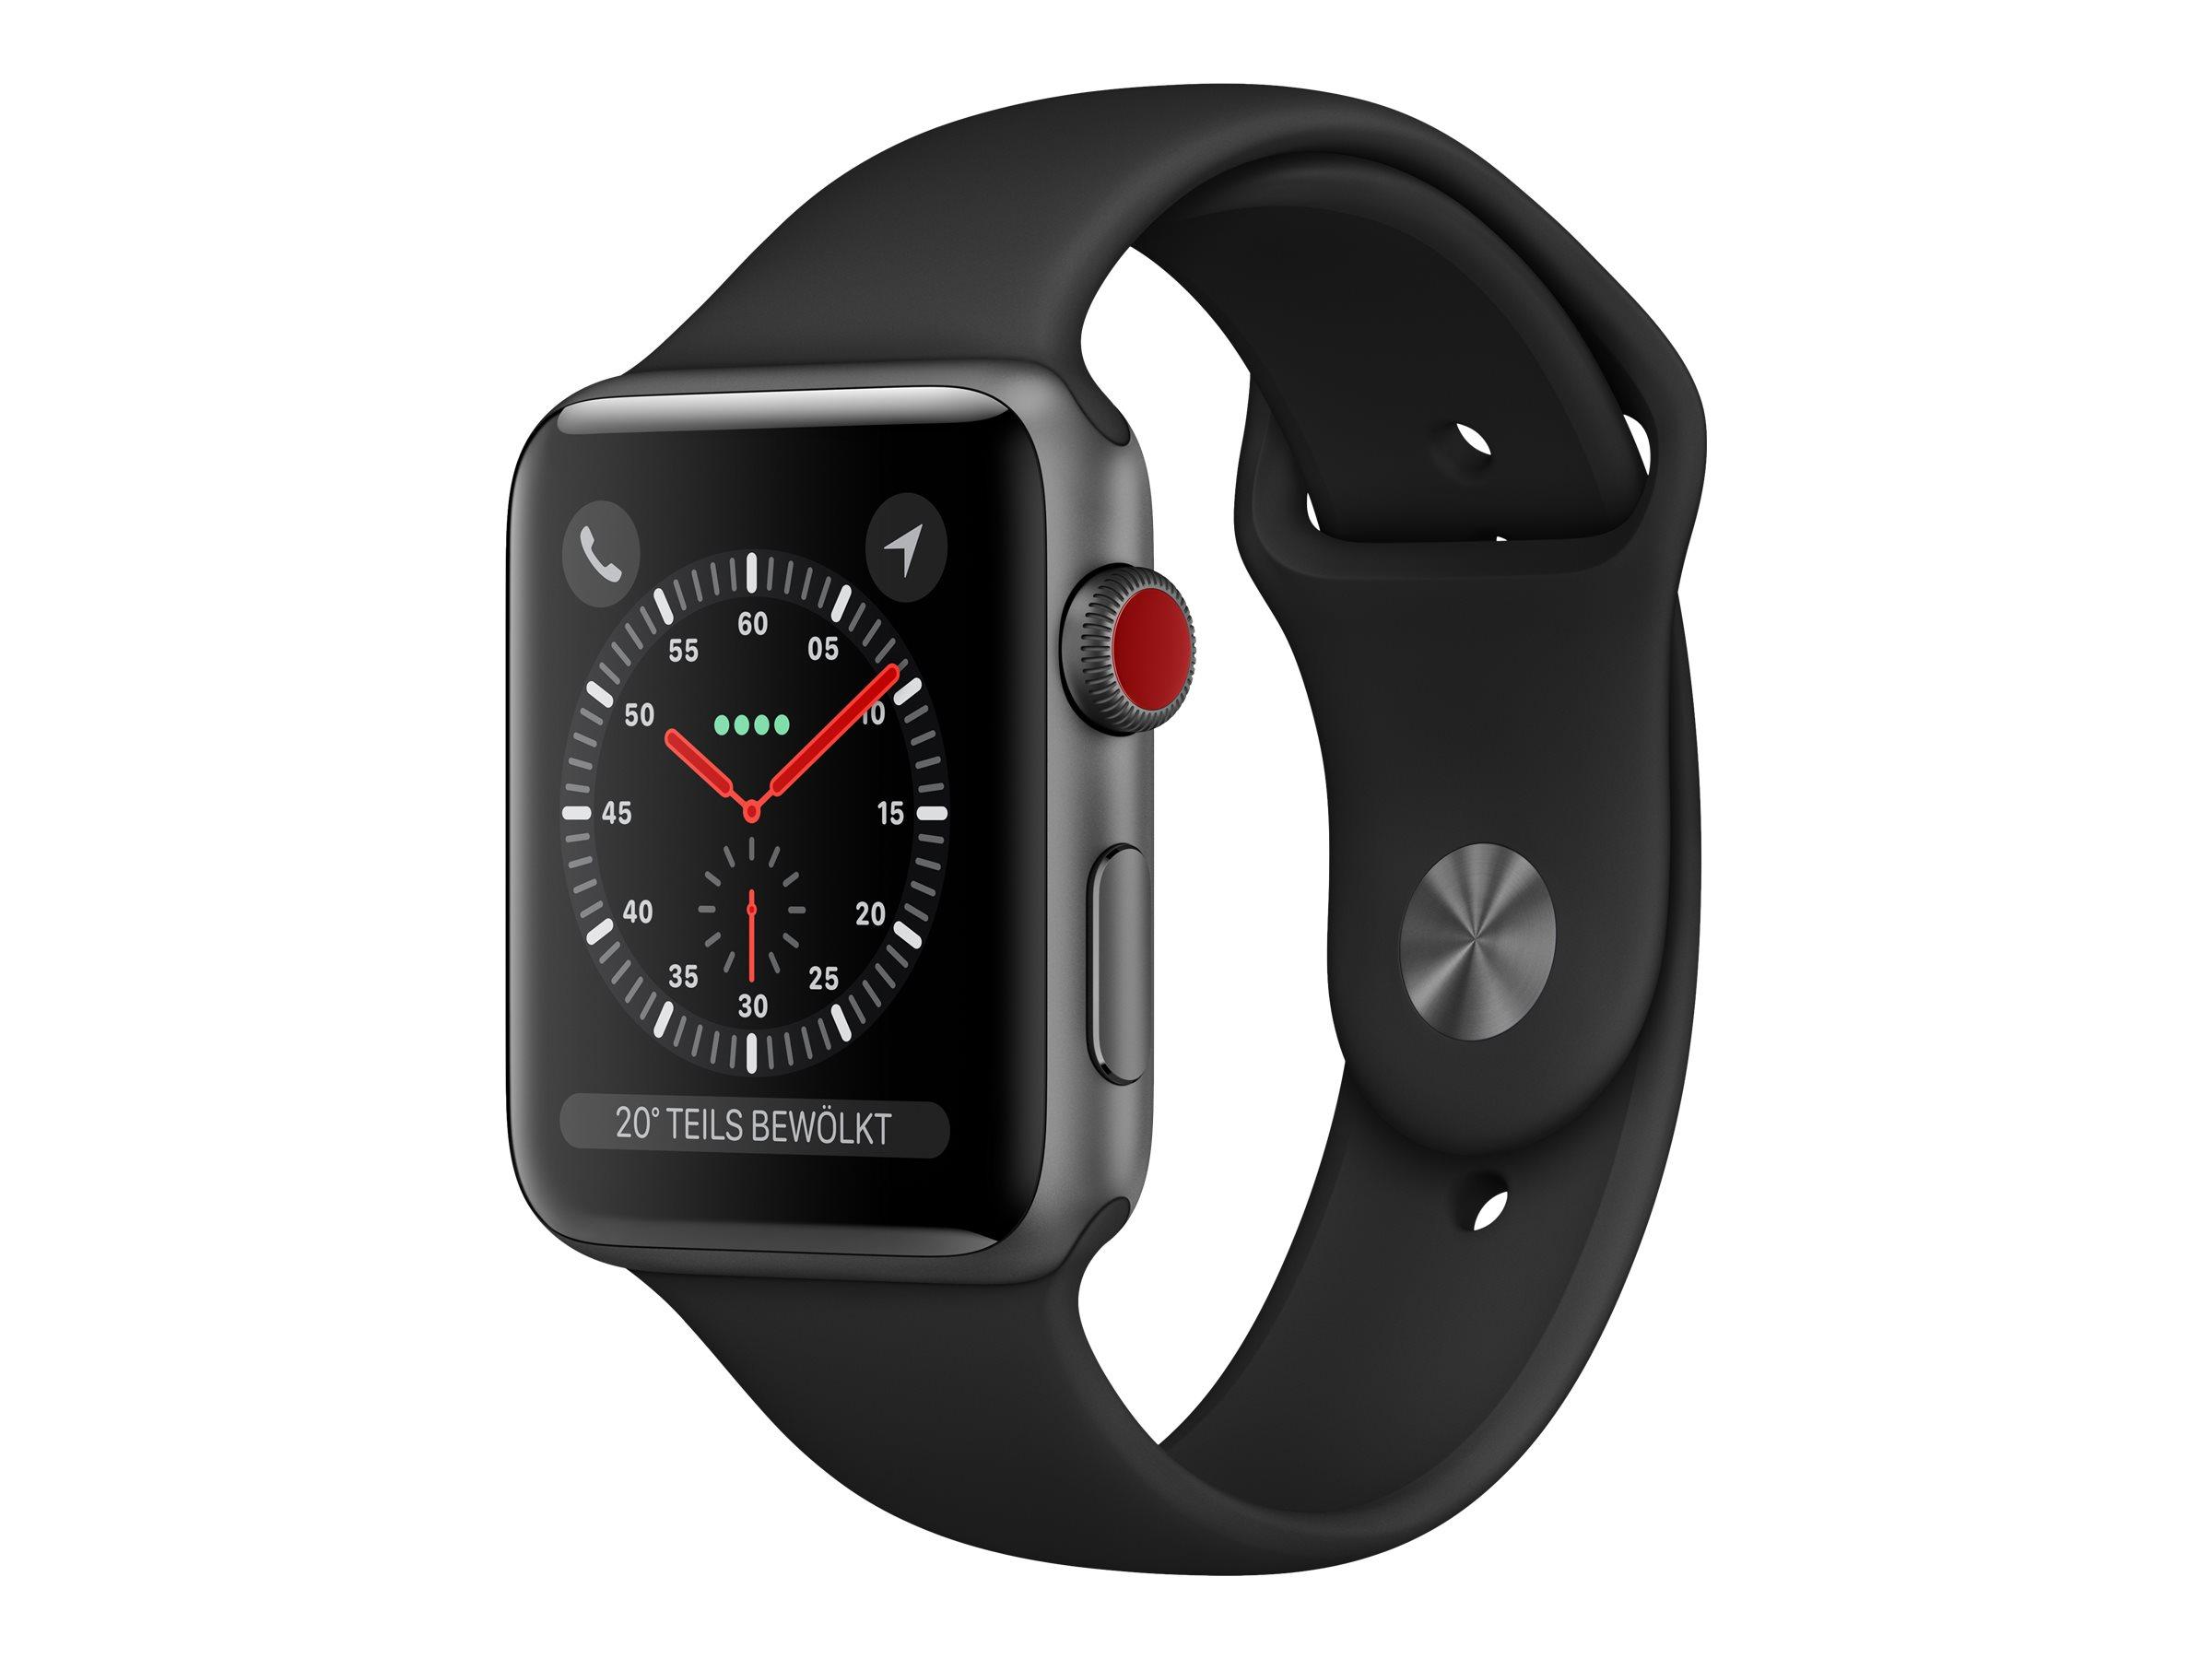 Apple Watch Series 3 (GPS + Cellular) - 38 mm